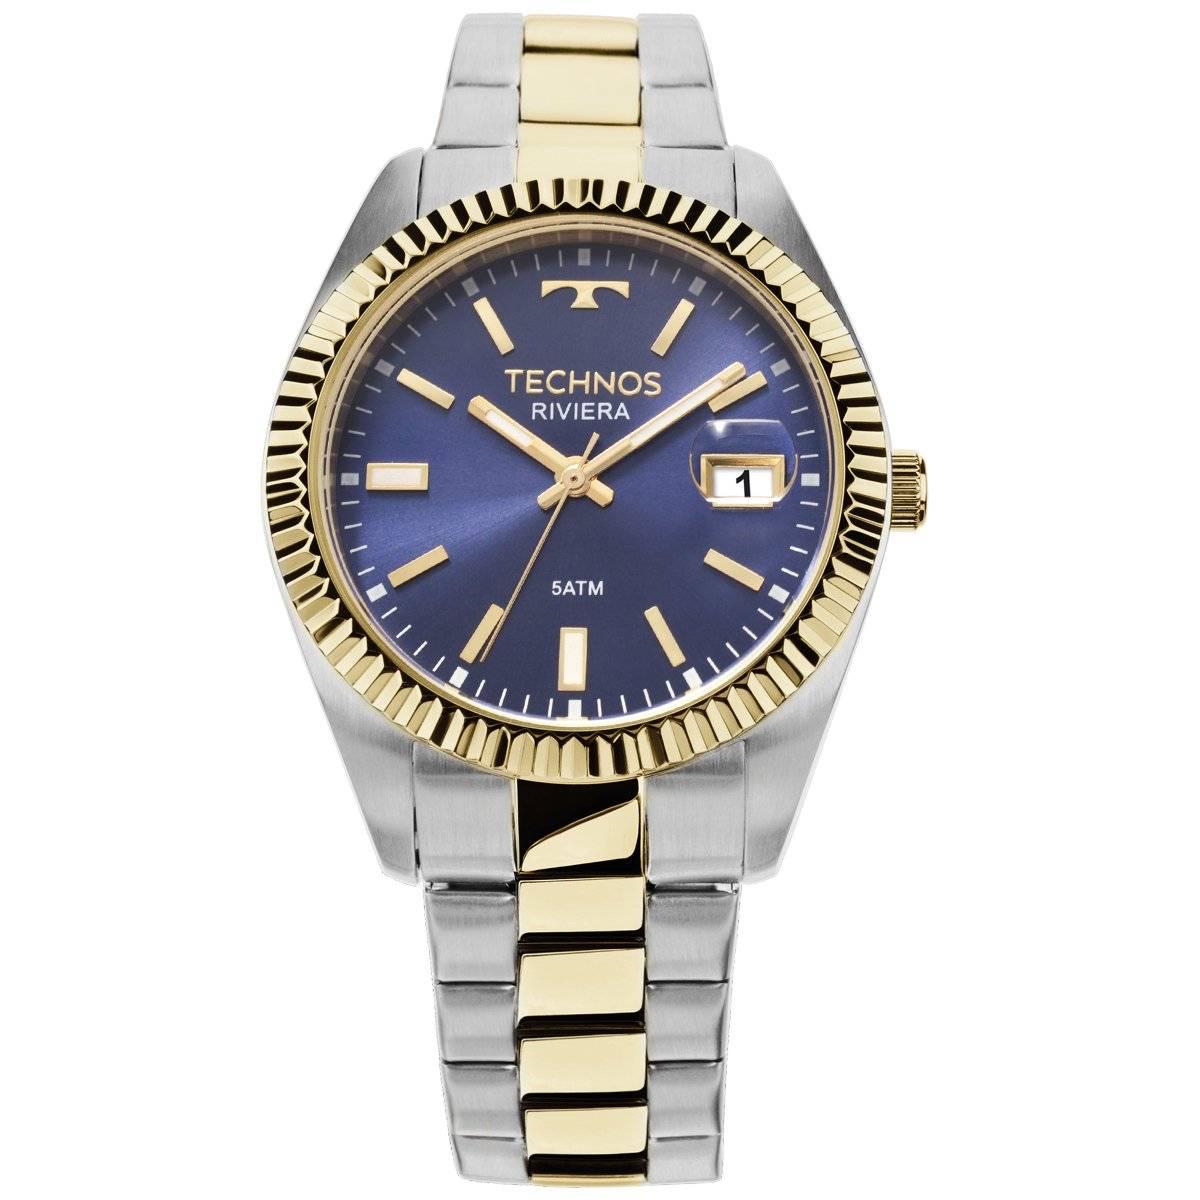 Relógio Technos Elegance Riviera Feminino Quartz 2115KTT/5A